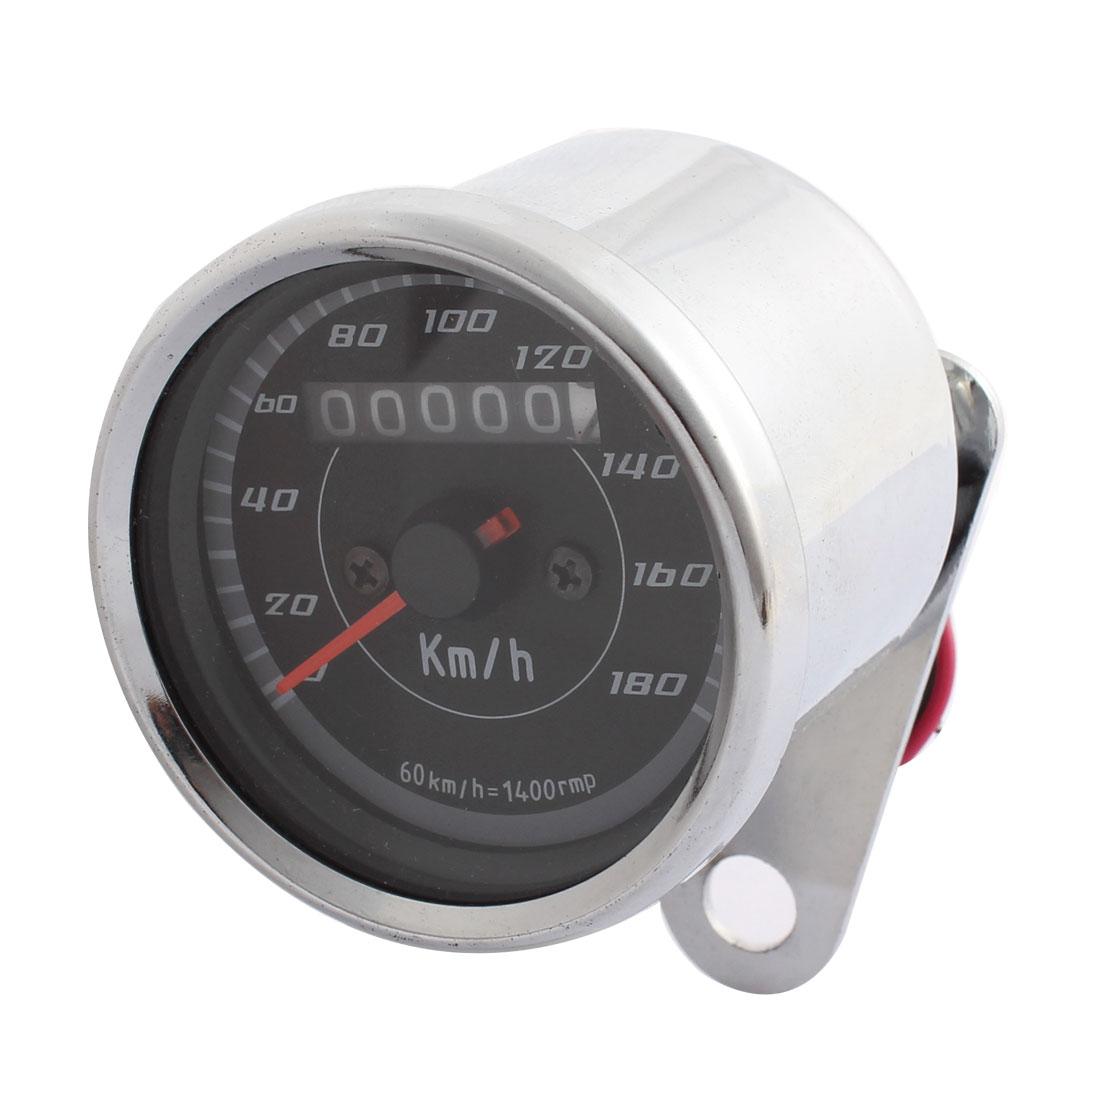 0-180km/h Motorcycle Odometer Tachometer Speedometer Sliver Tone Black